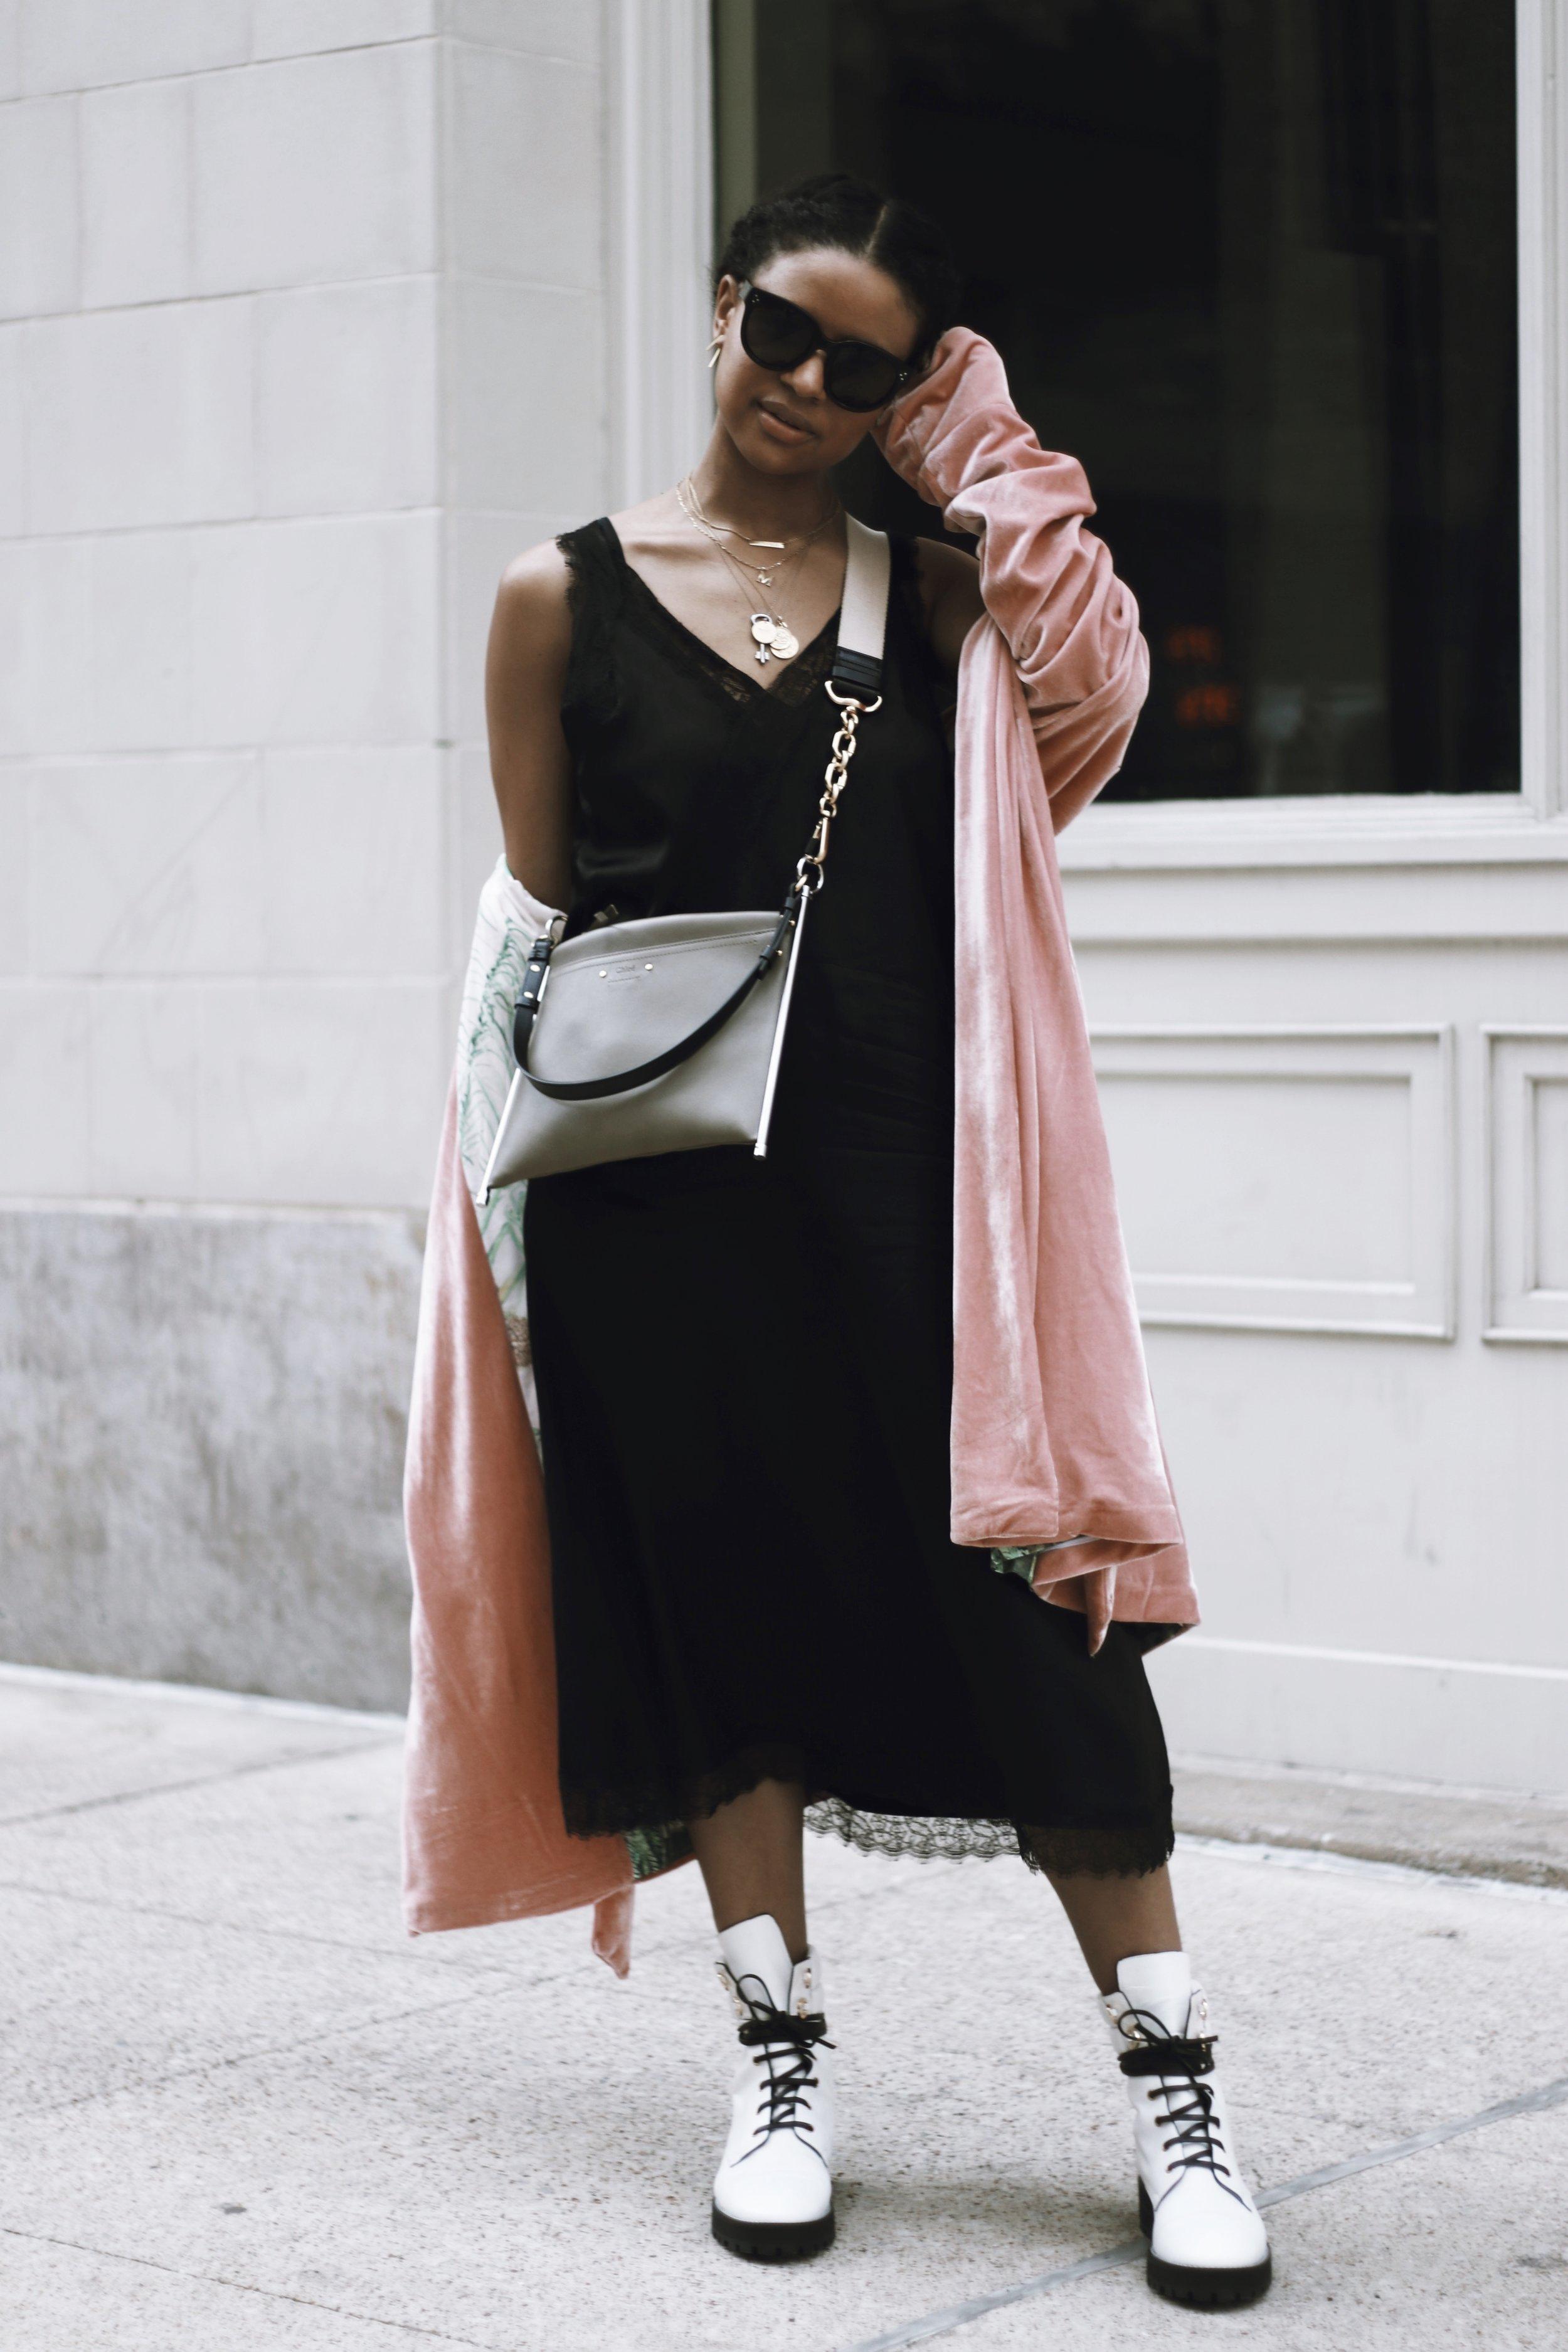 Old Slip Dress, similar  here  +  here .  Velvet Kimono , c/o Americae.  Boots .  Crossbody . Layered Necklaces, similar  here  +  here .